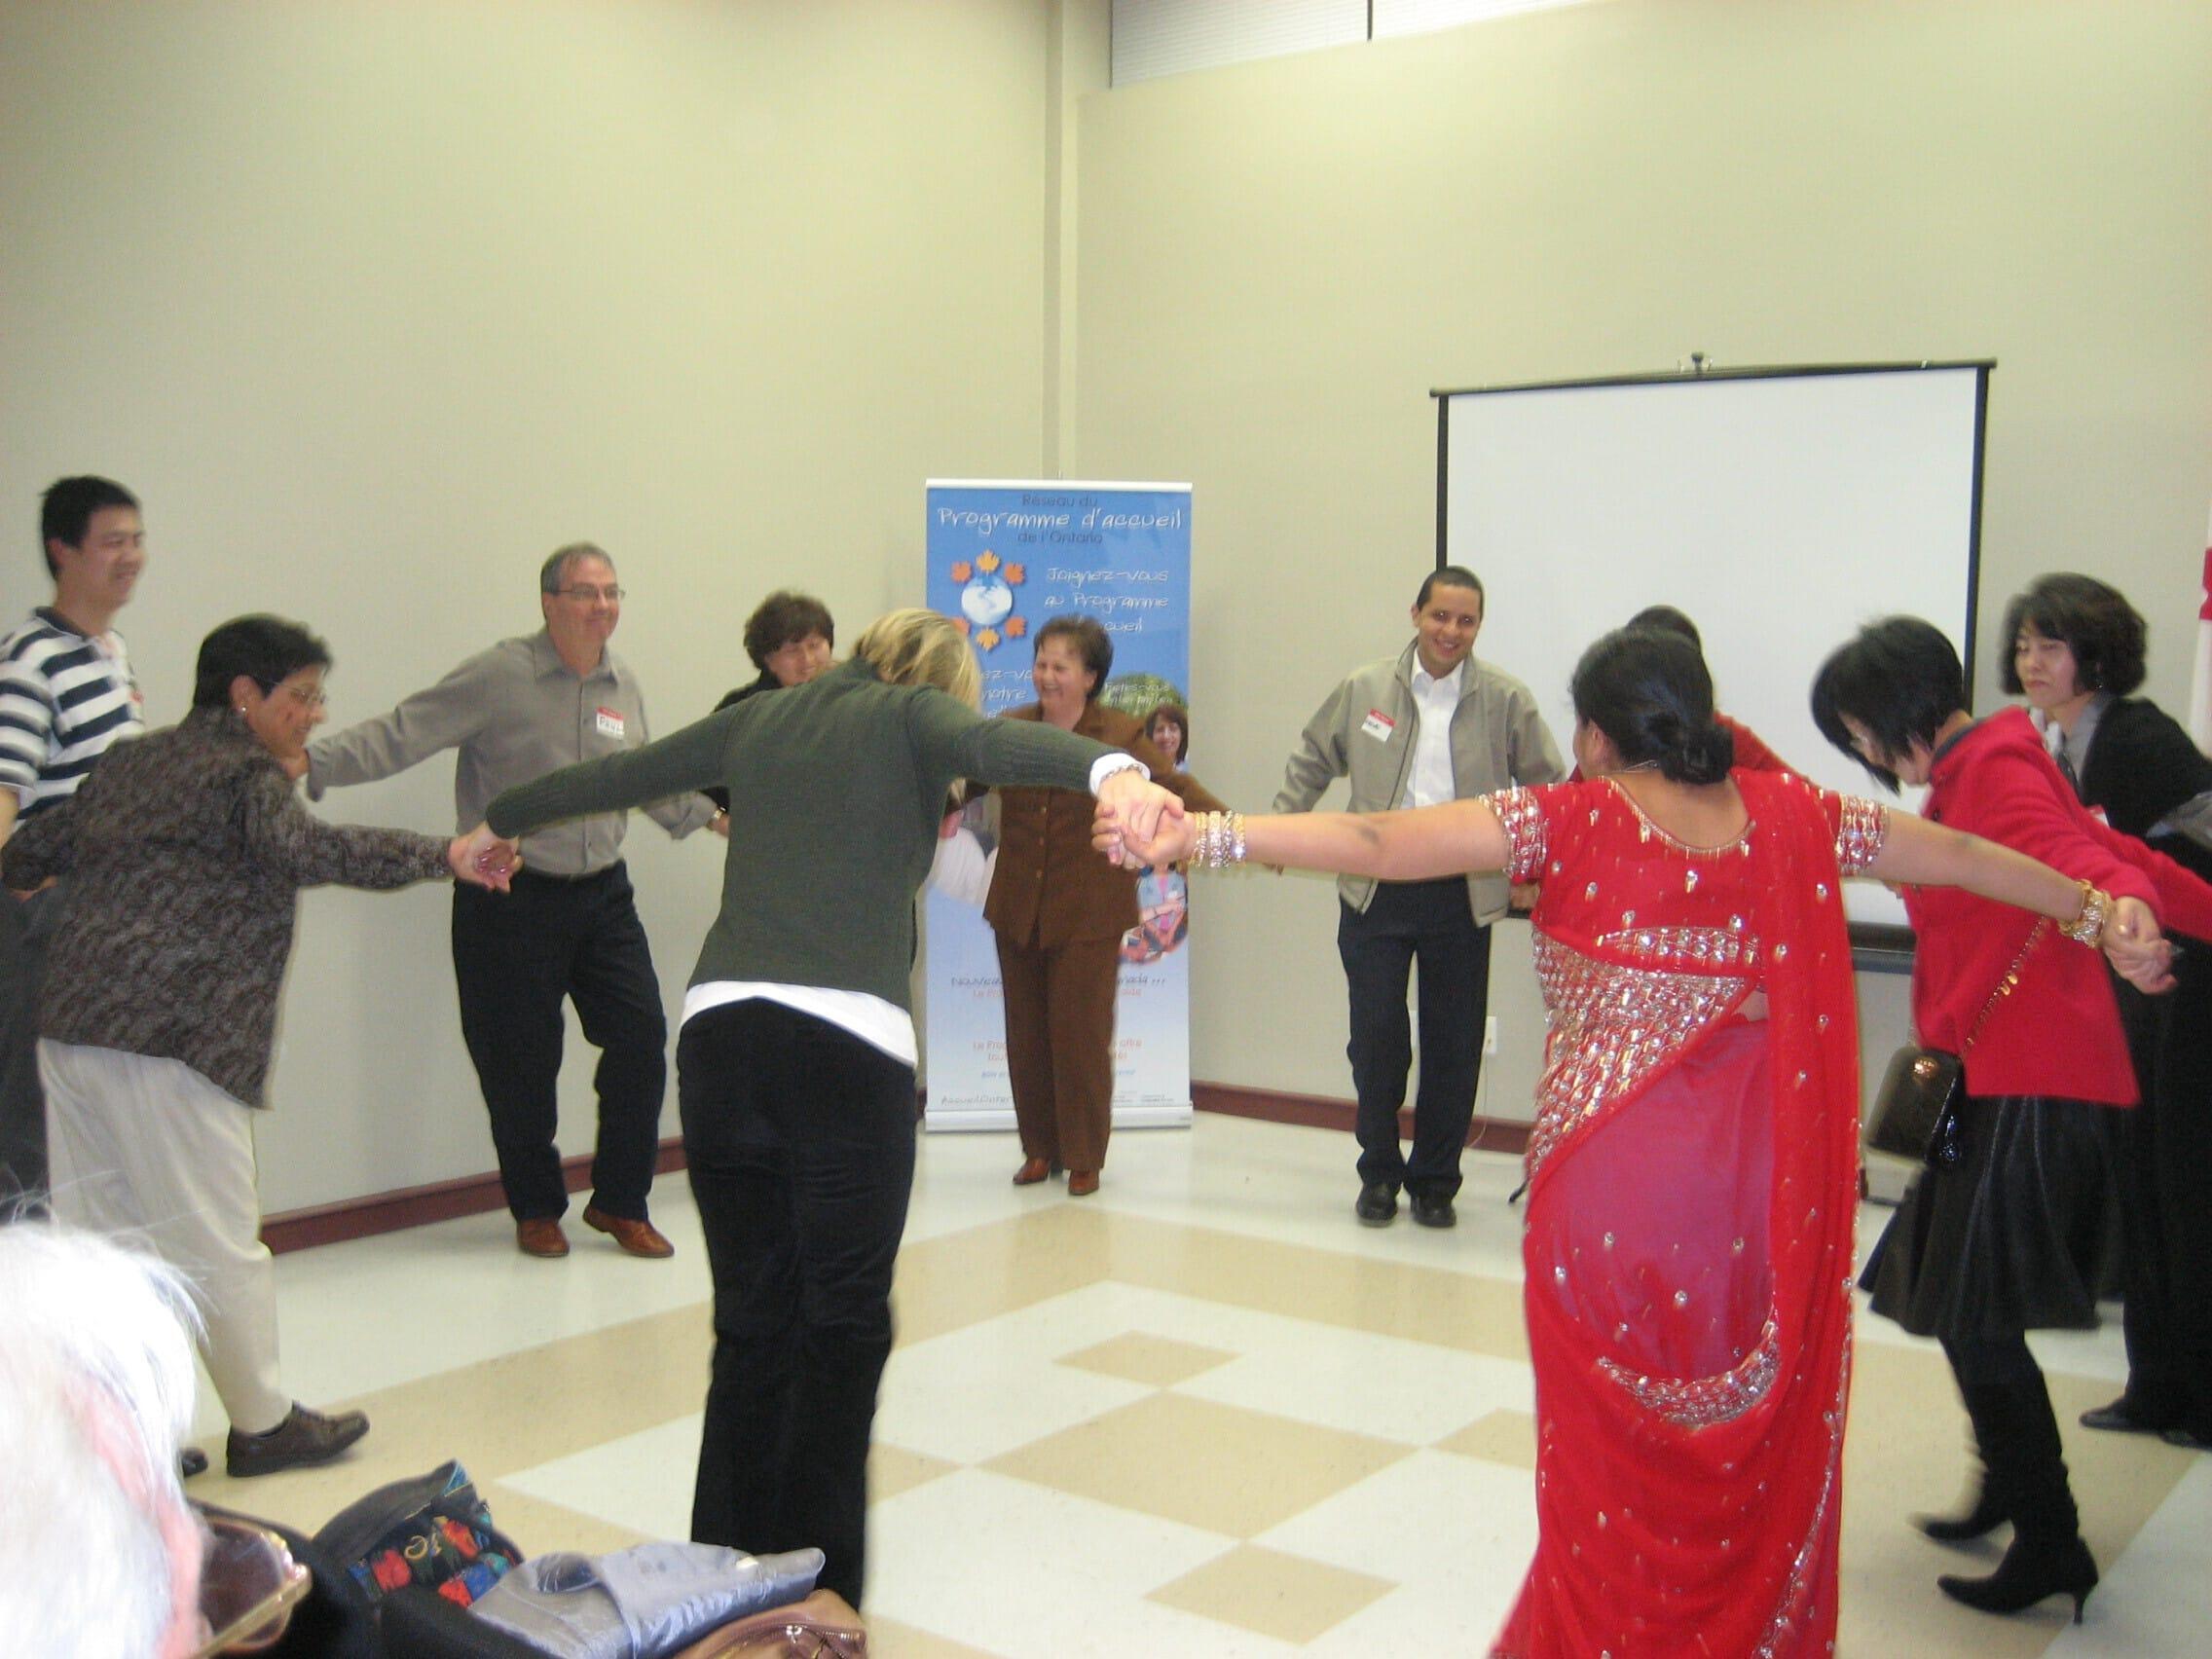 Dance Workshop with Anandita at HMC